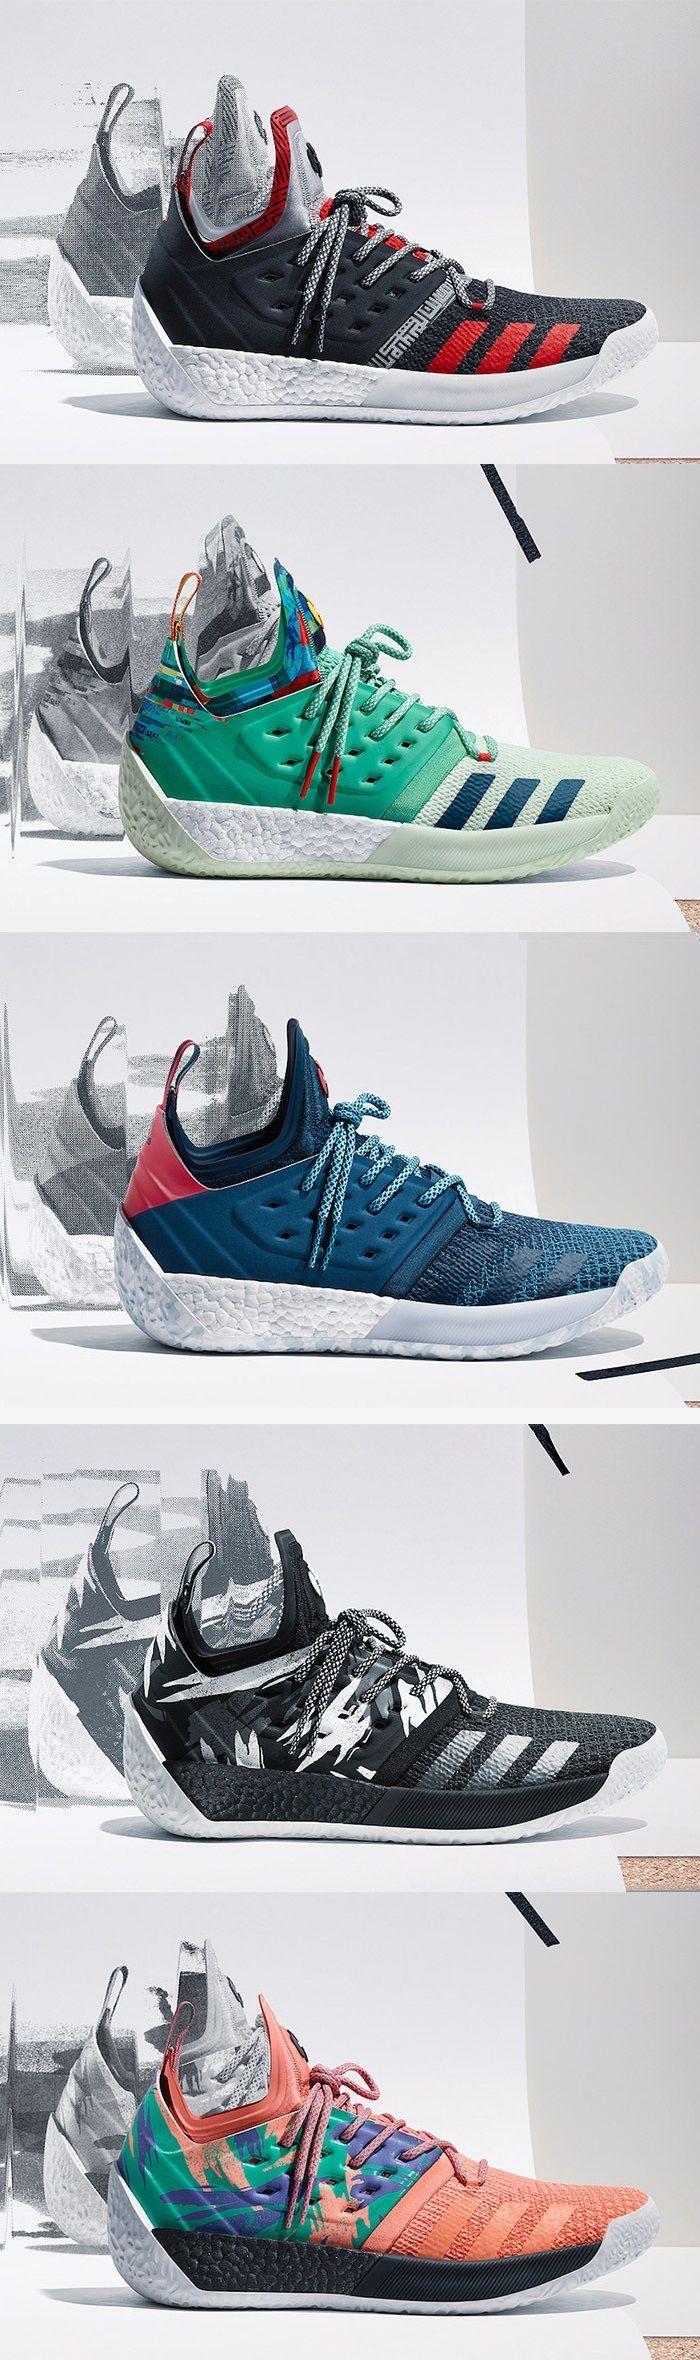 Adidas baloncesto Zapatillas de baloncesto Adidas Harden 2 sneakersadidas Pinterest 0afae8